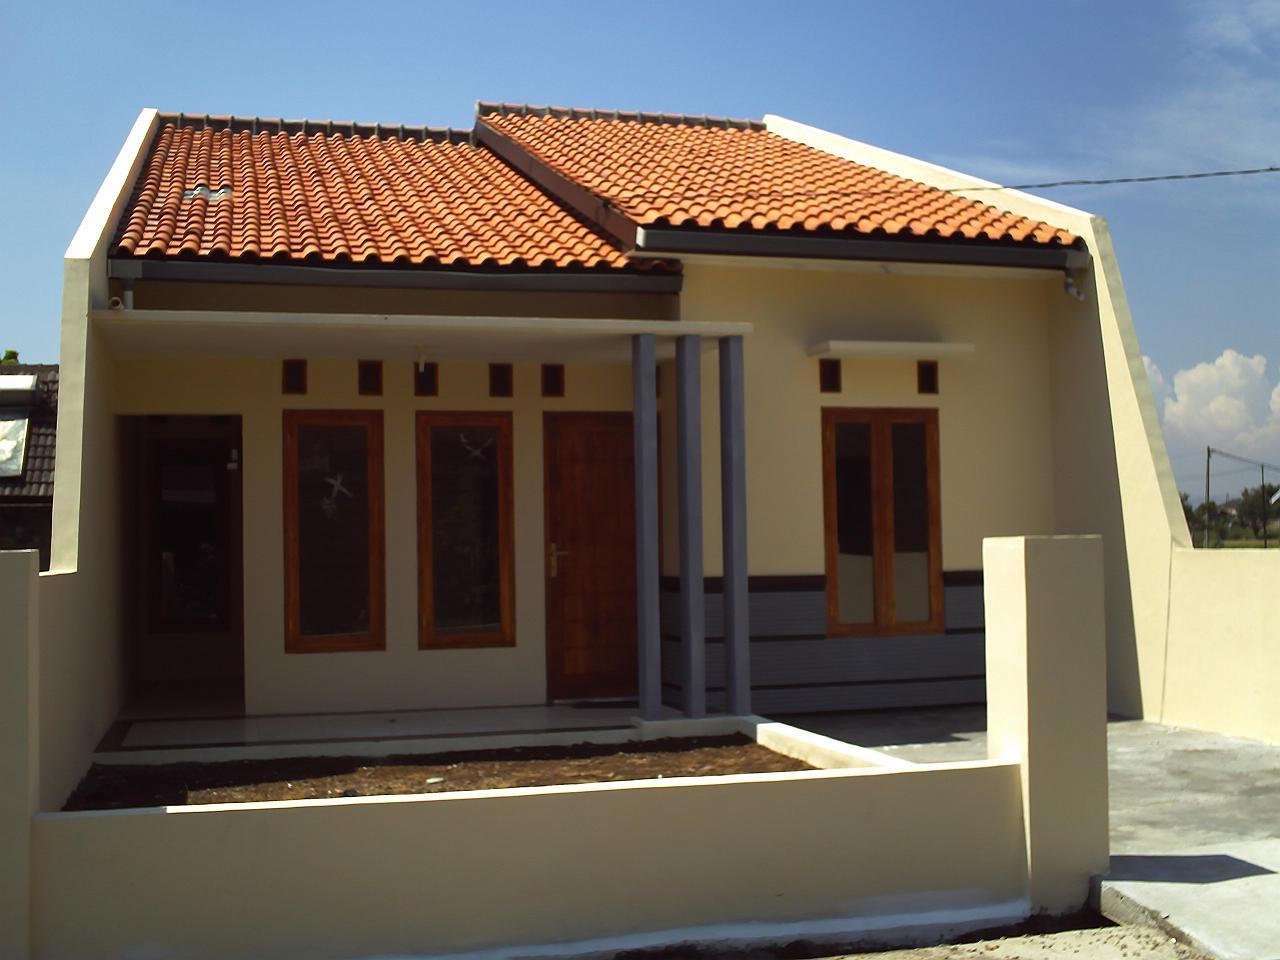 Dijual Rumah Baru Komplek Nuansa Mas Lt 145 Lb 90 Hrg Rp 285 Jt Nego